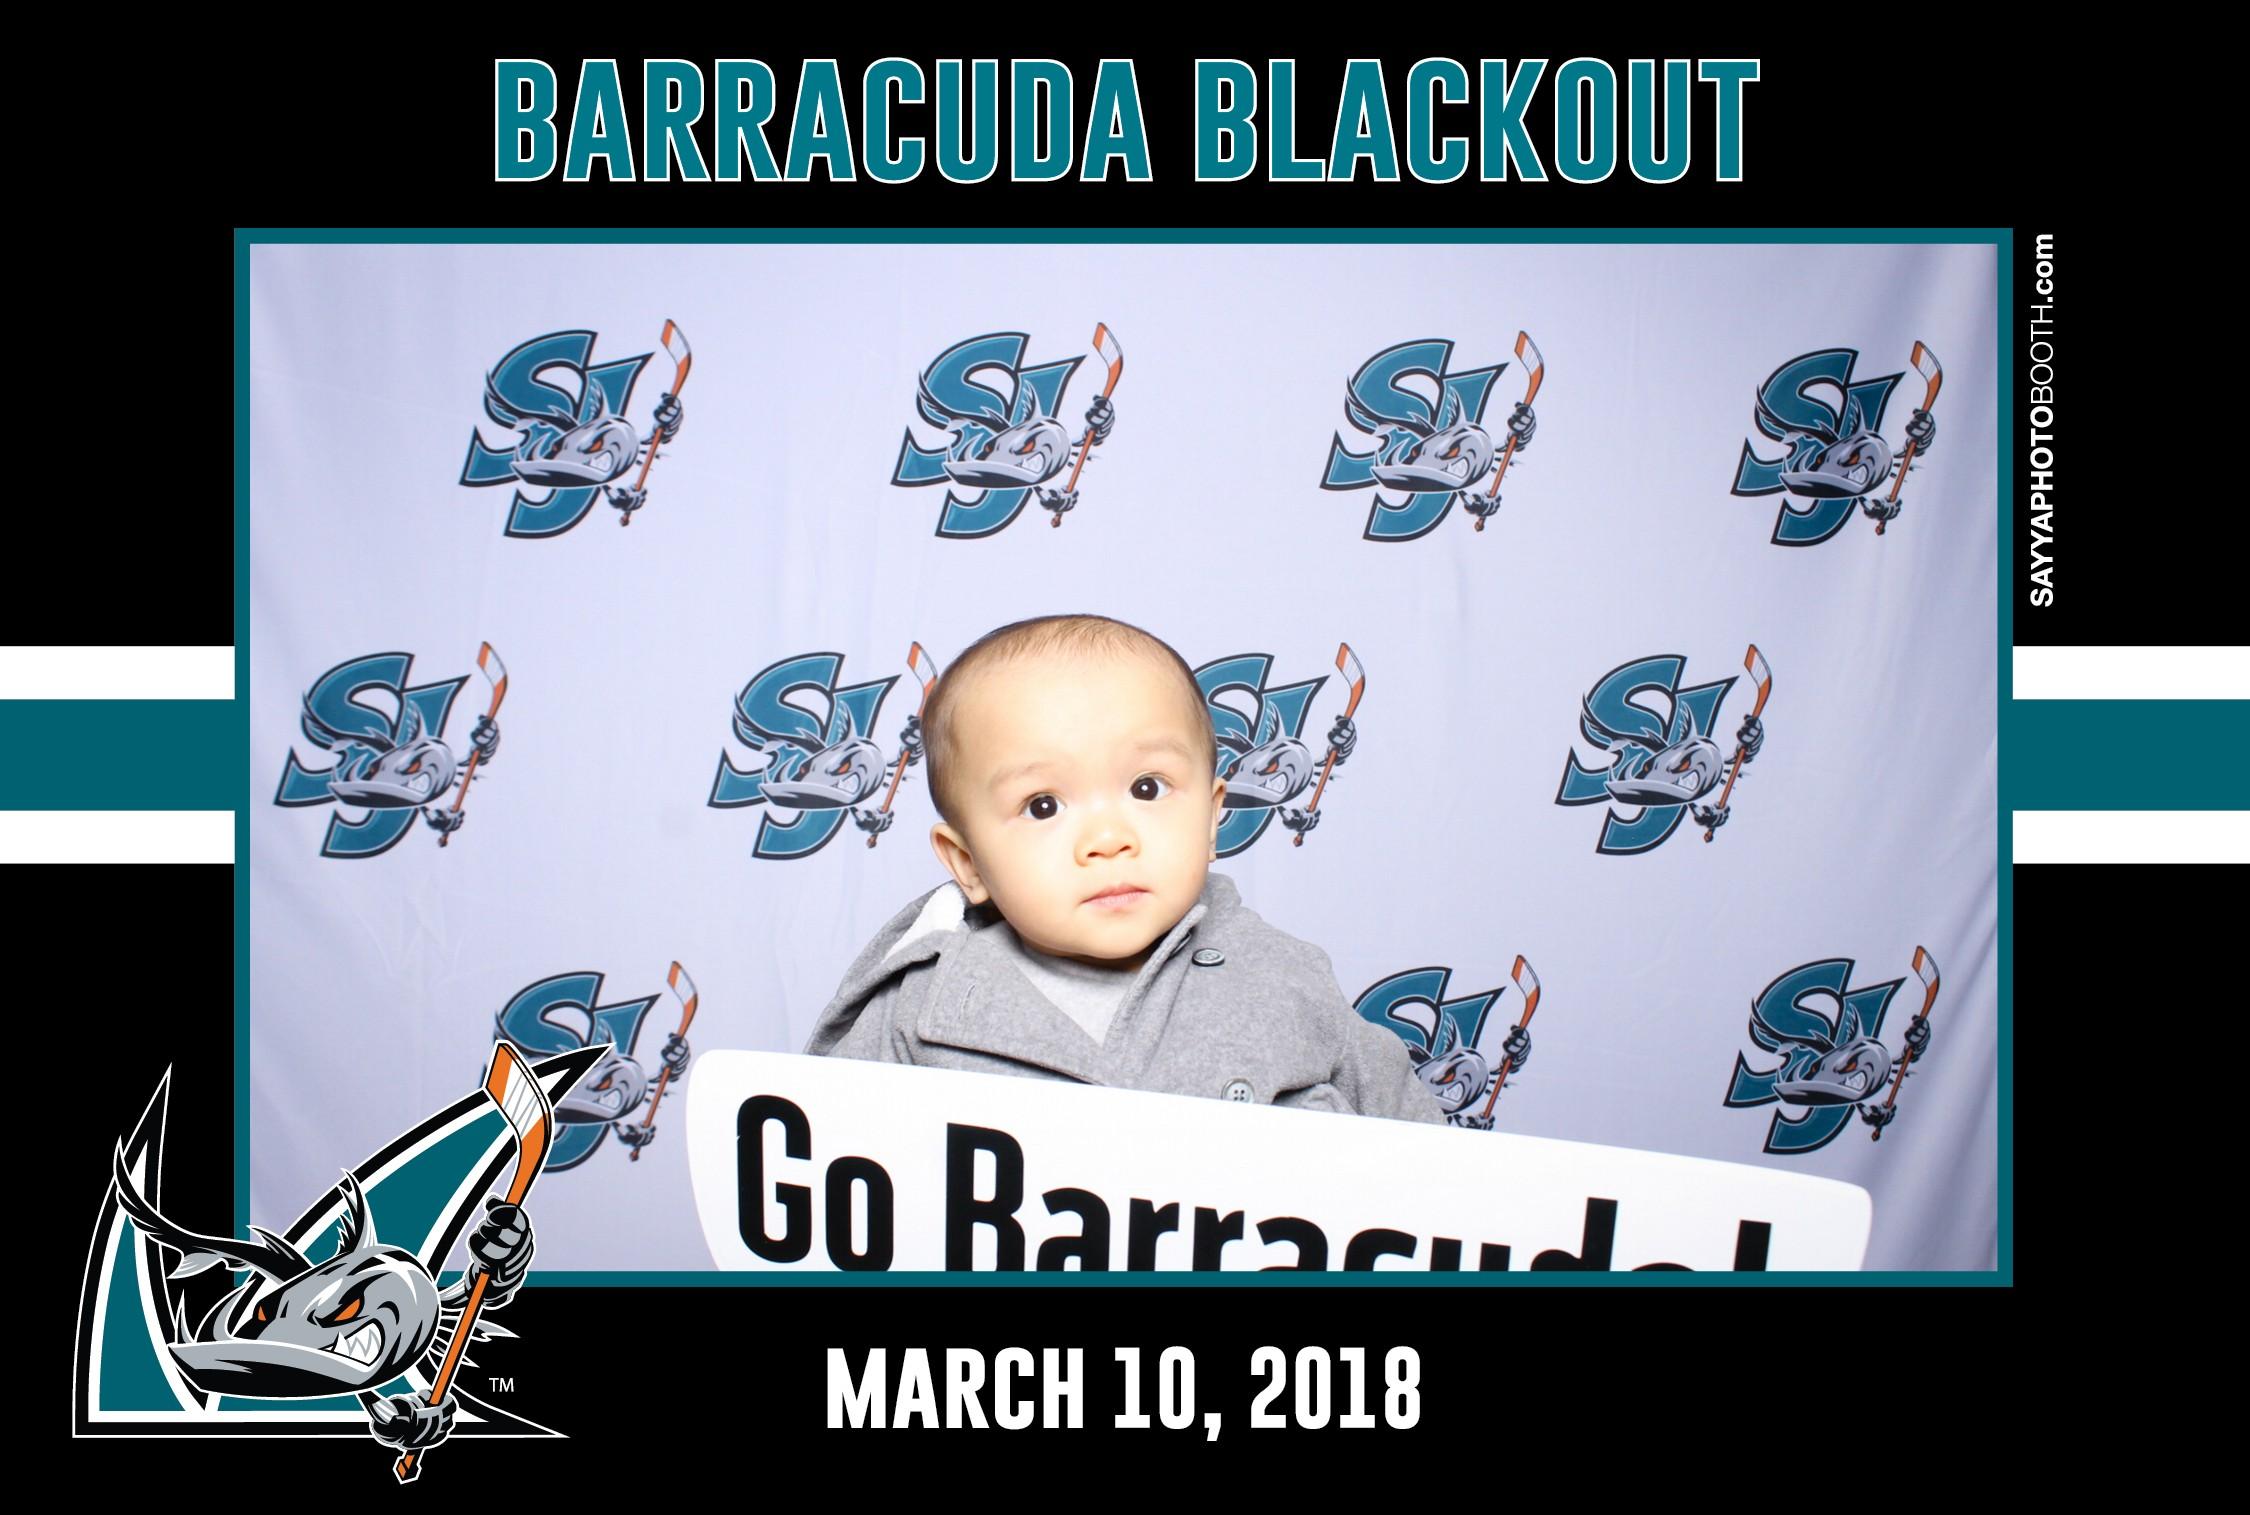 Barracuda Blackout